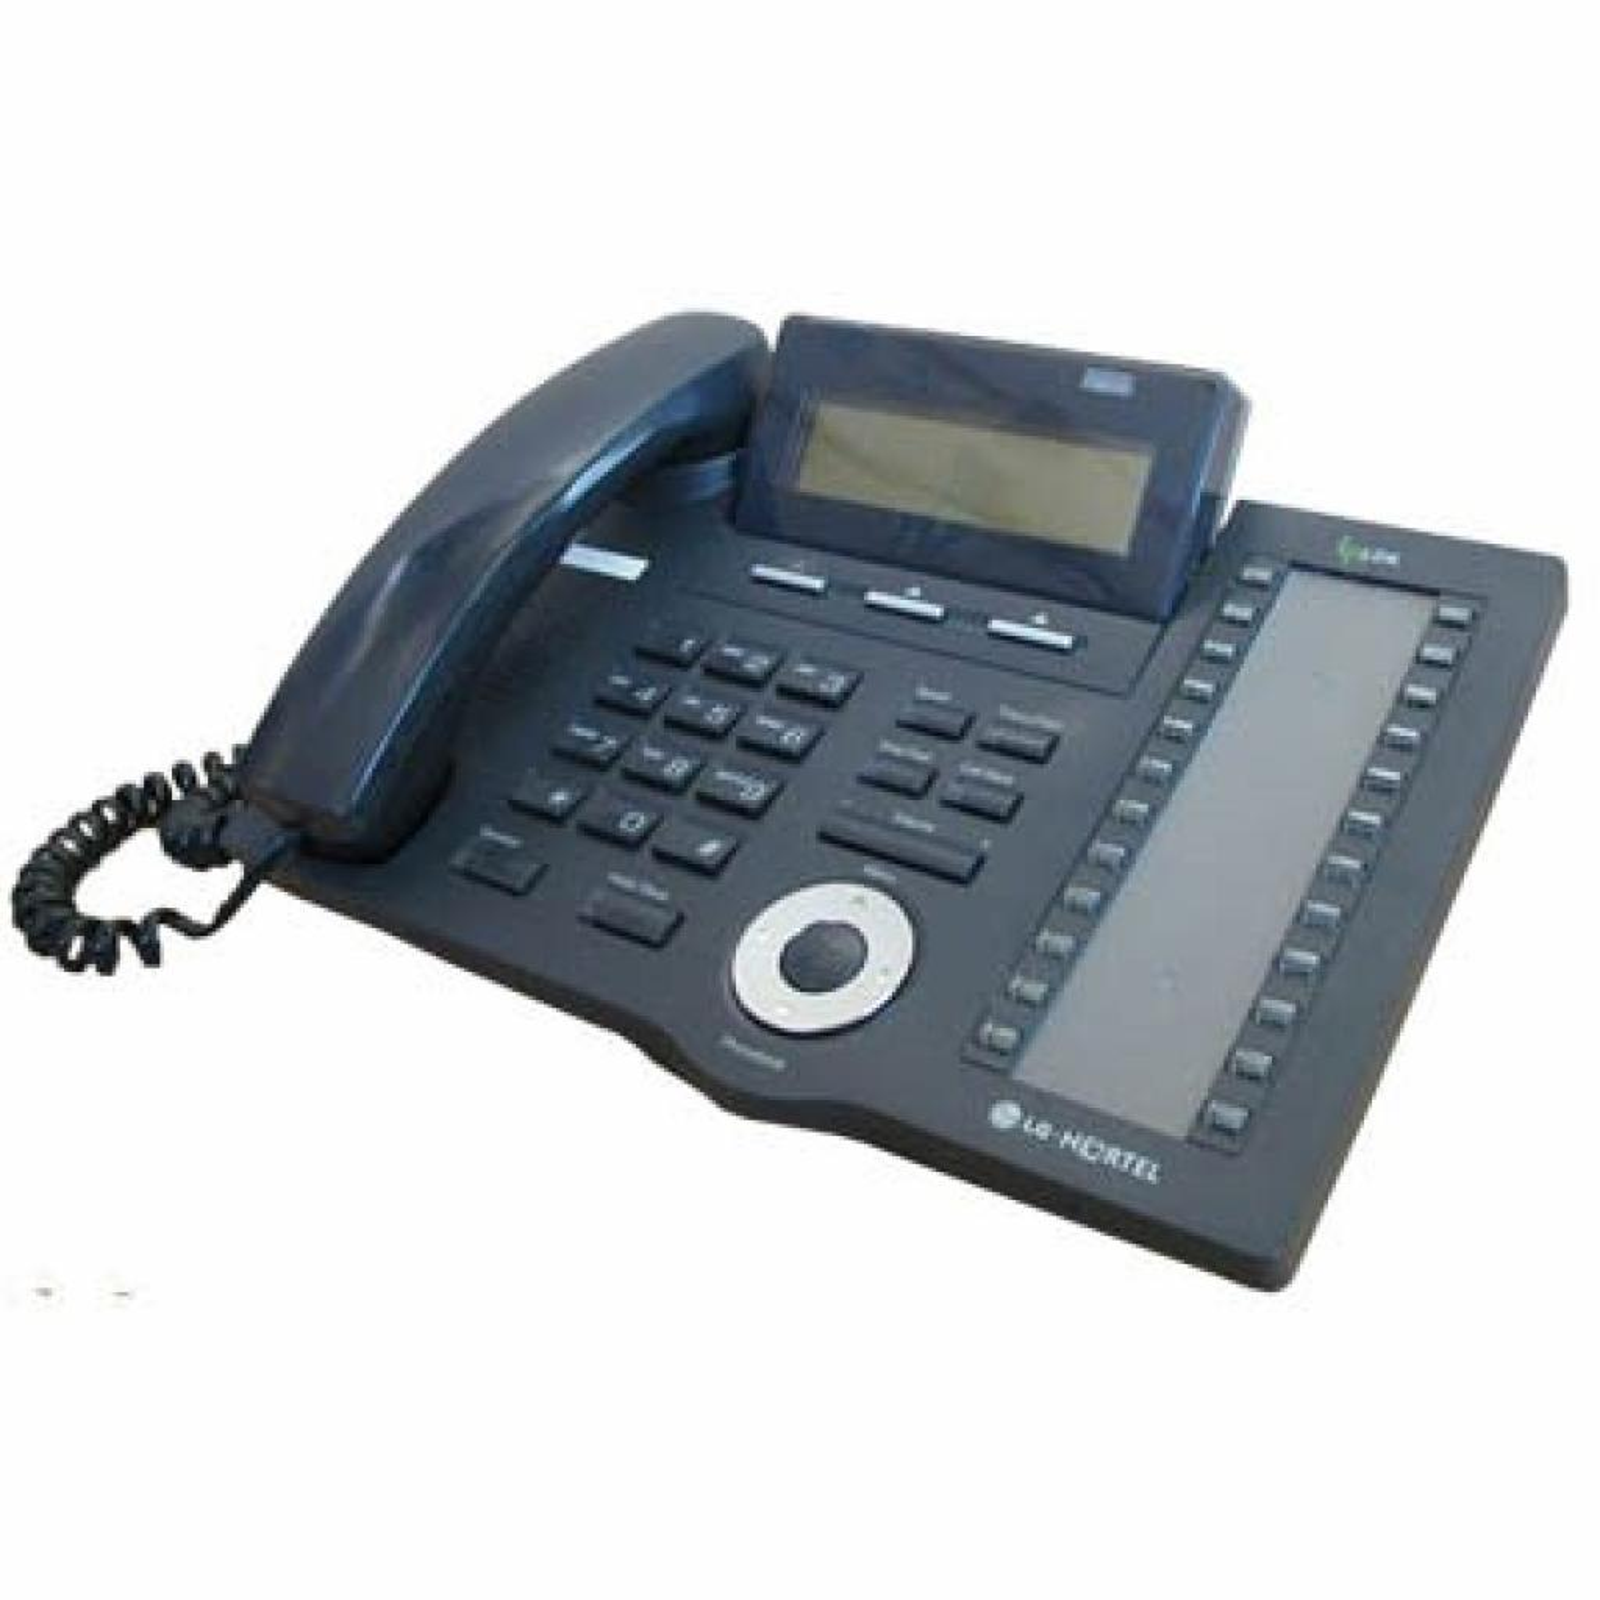 Телефон LG LDP-7024D Grey